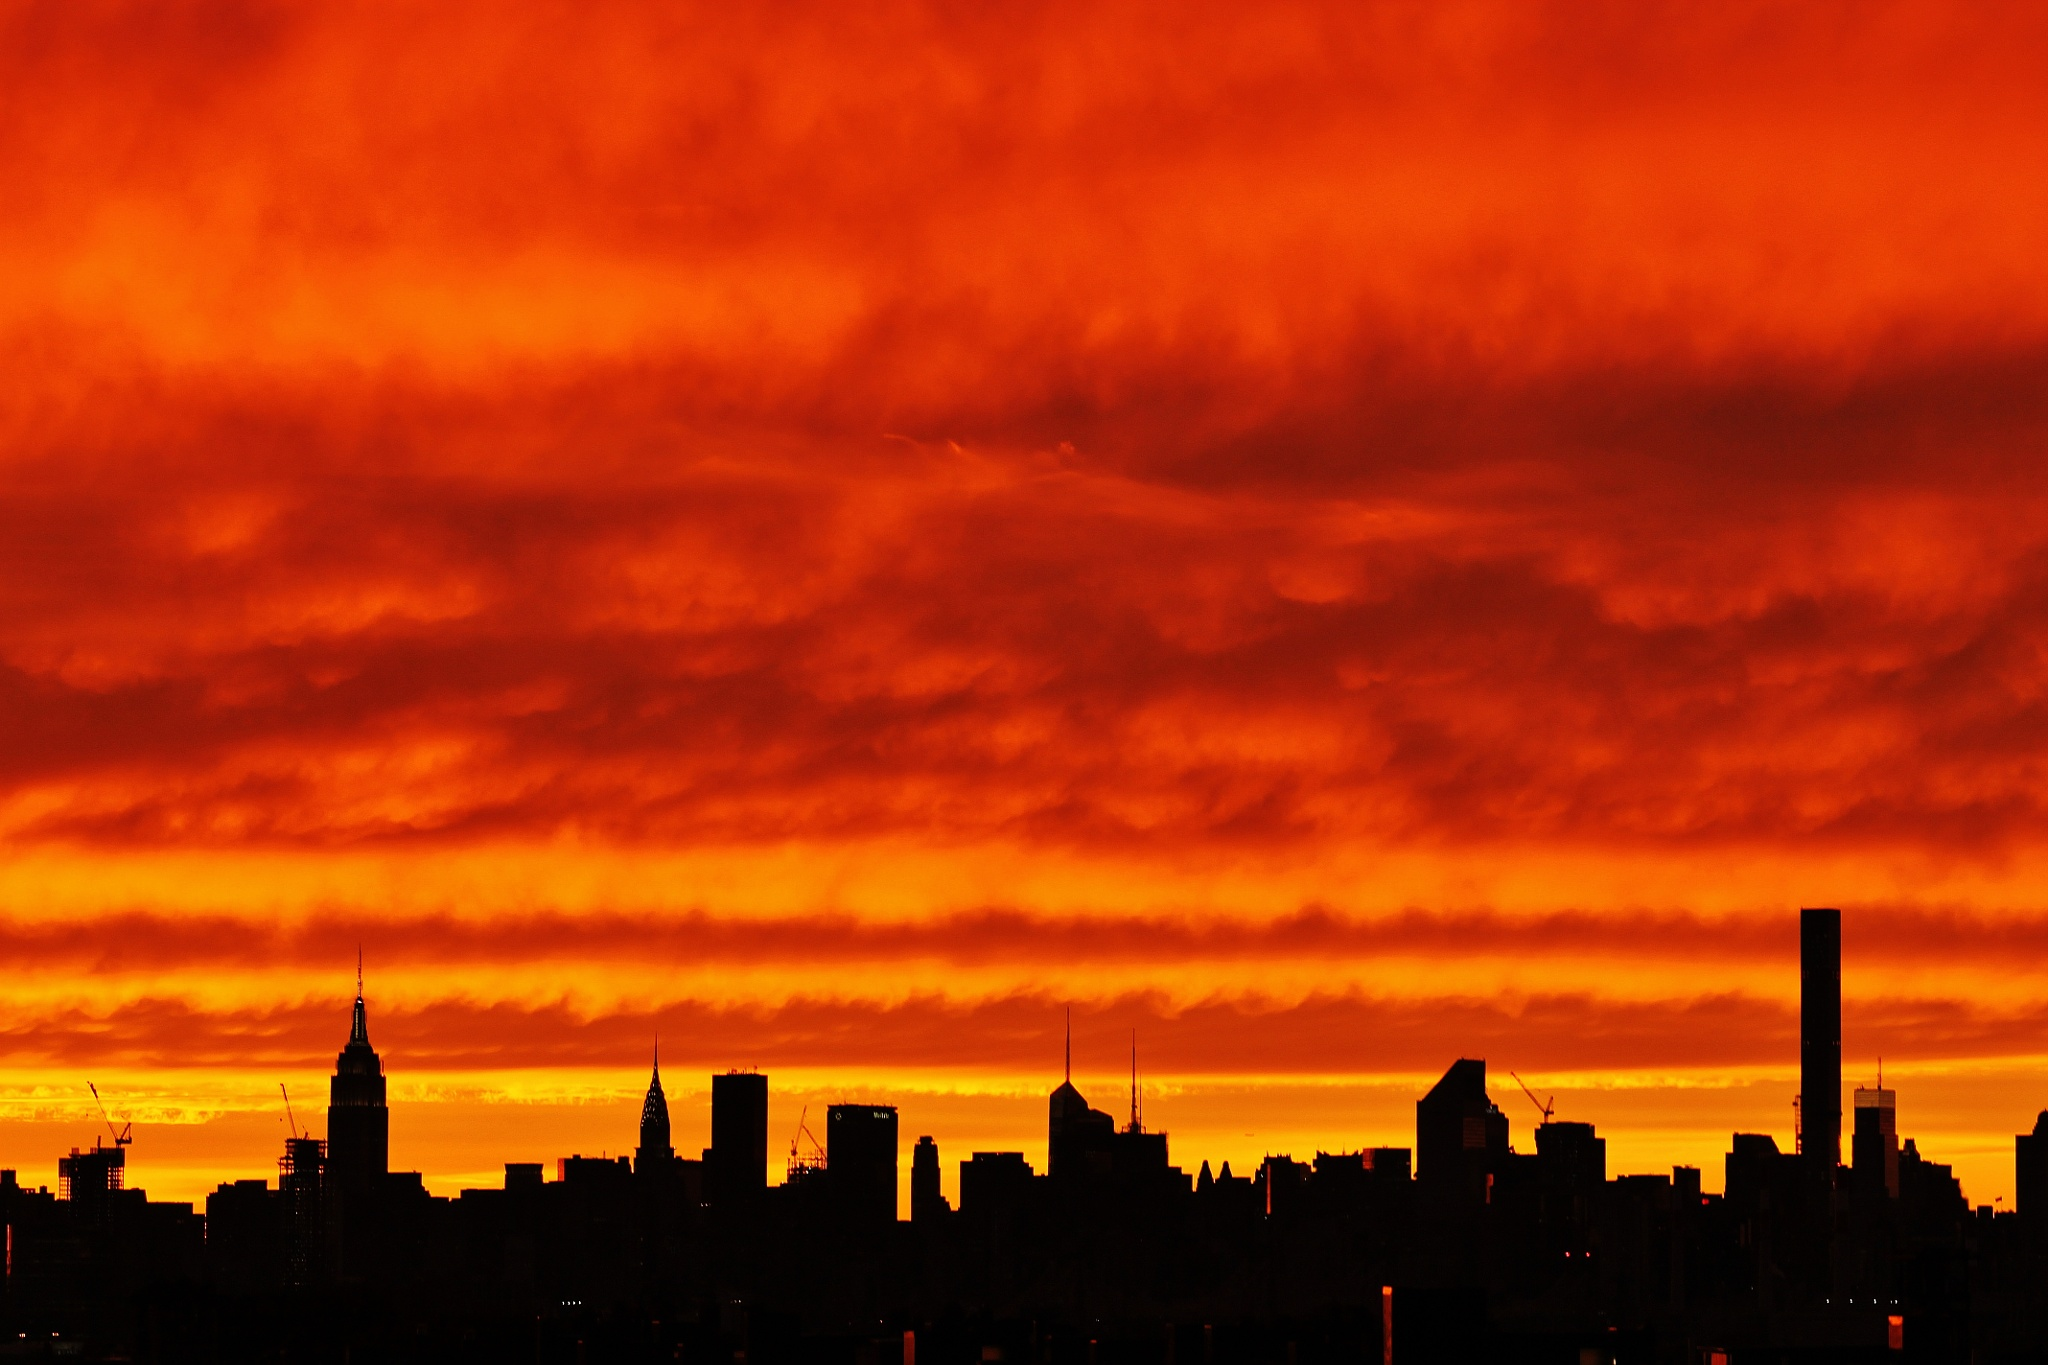 Sunset over Manhattan, by Liborio Drogo